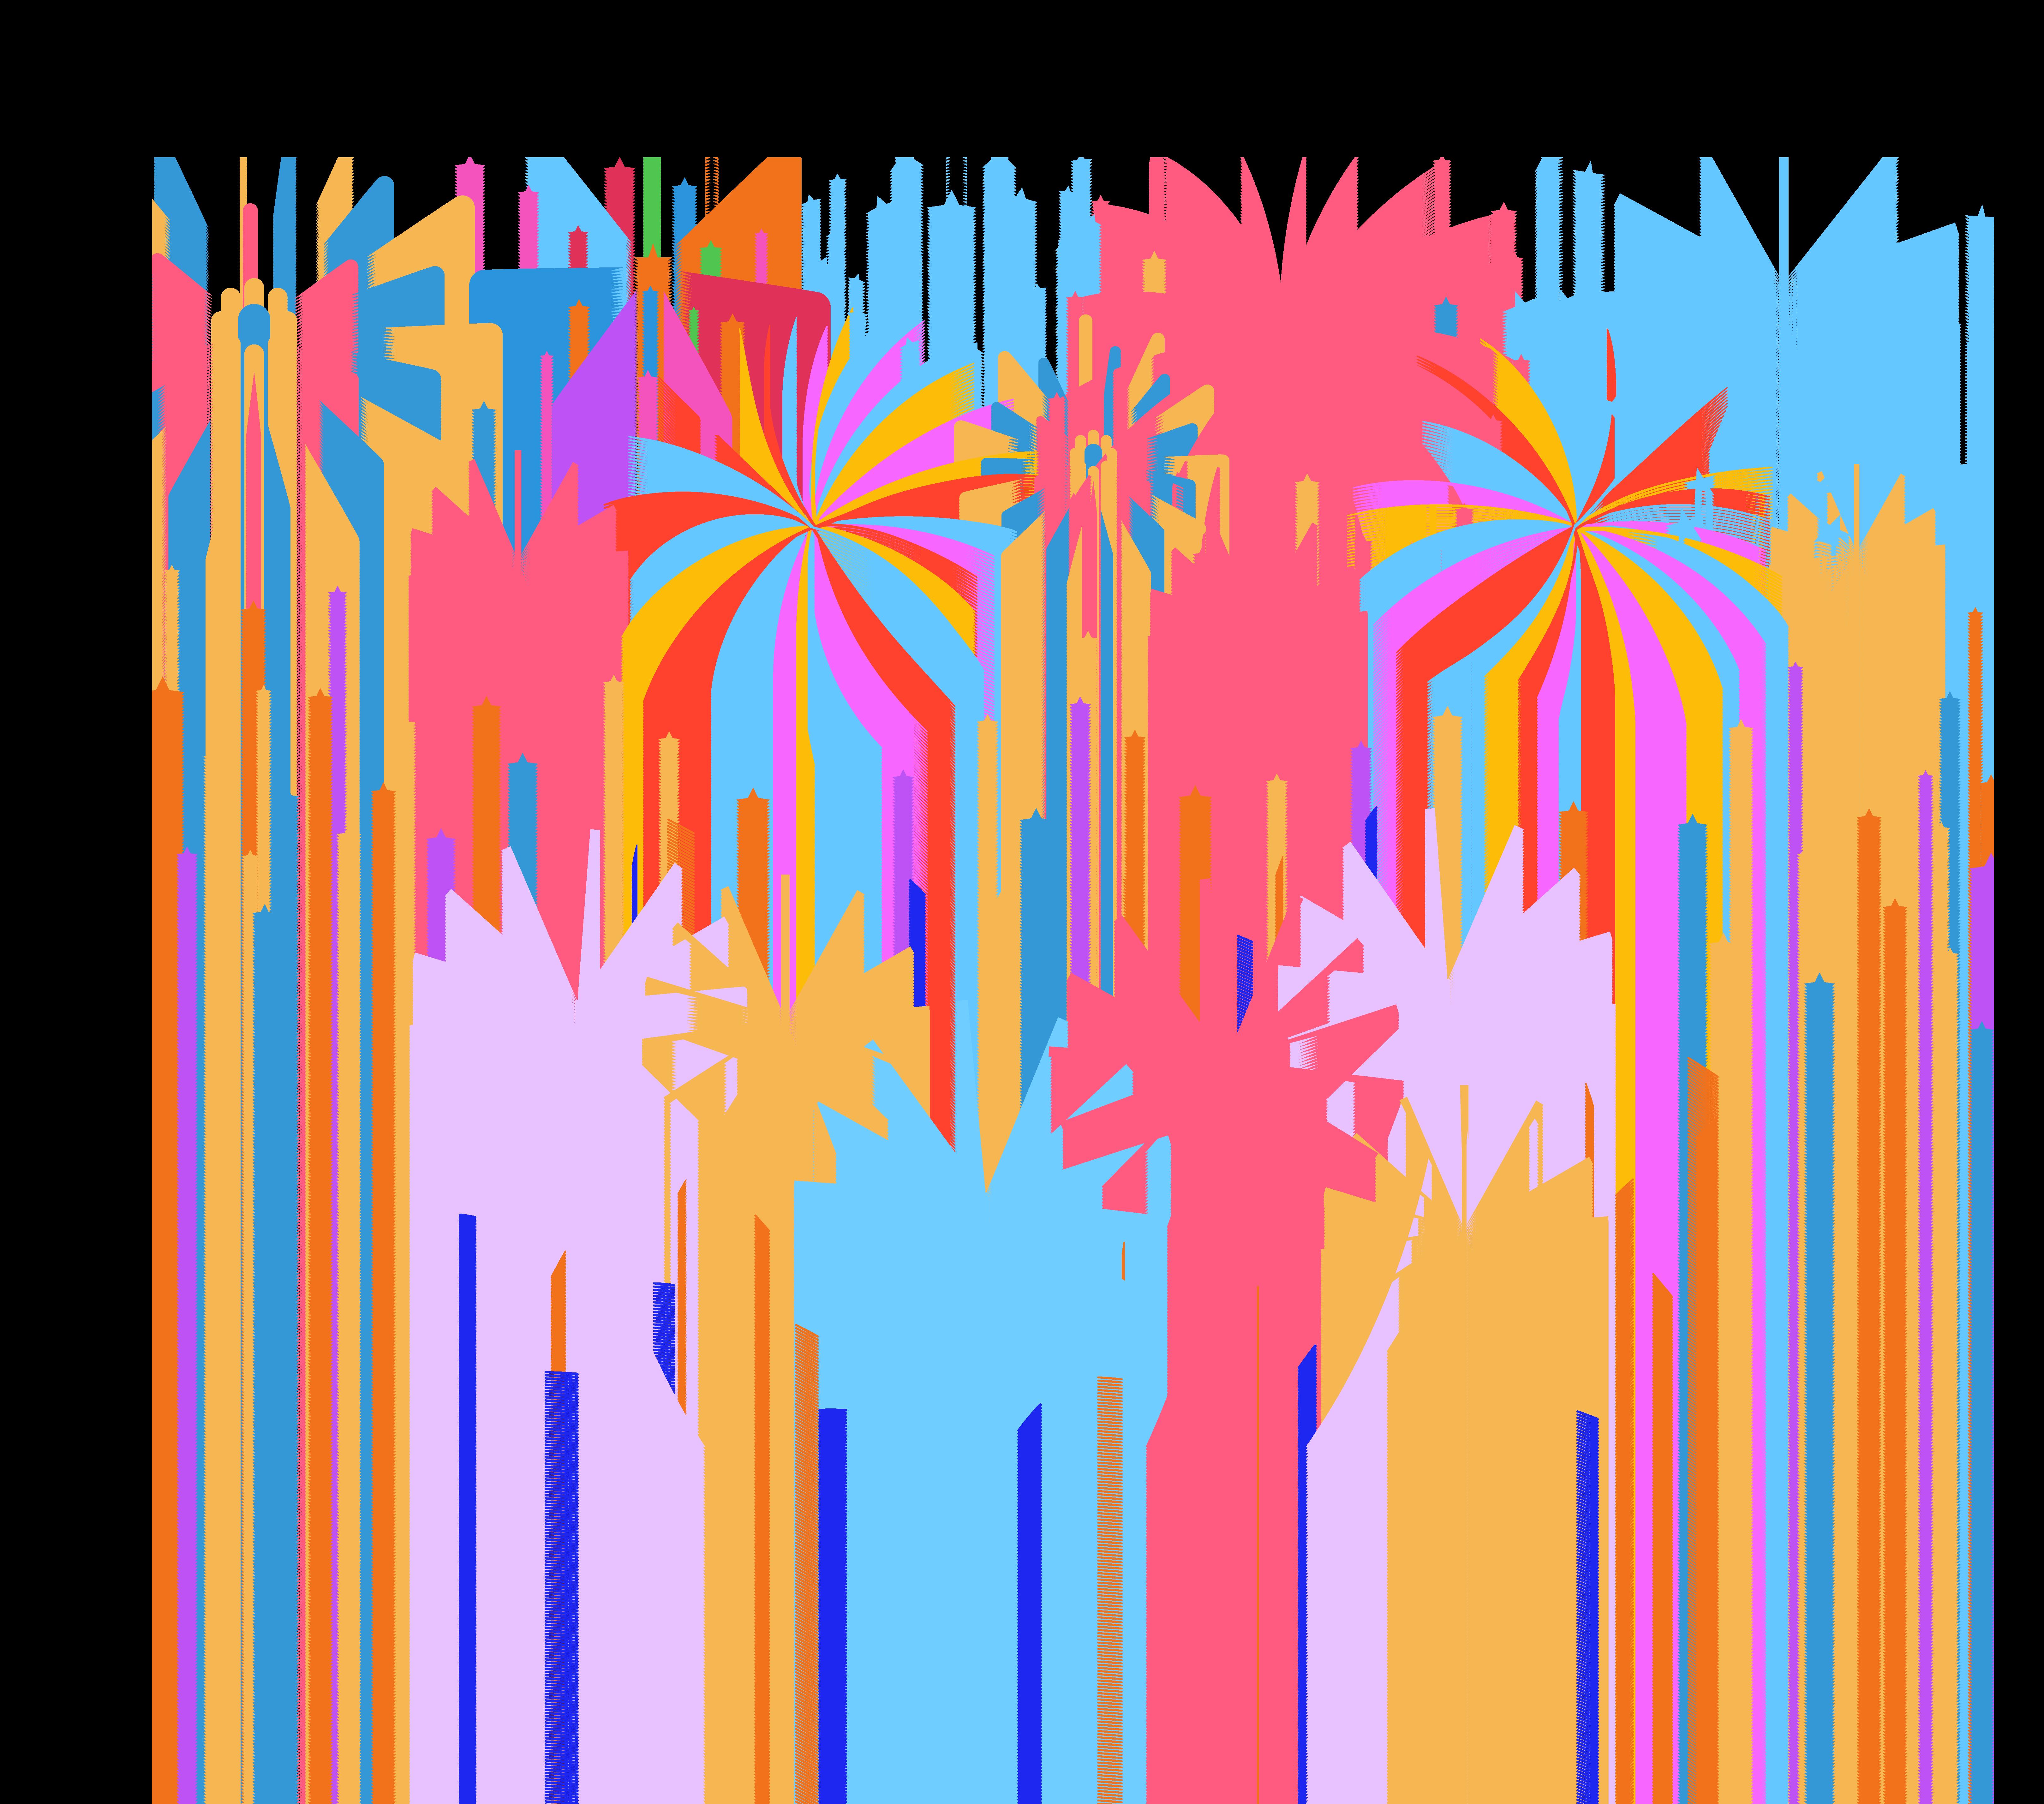 Clipart fireworks confetti. Adobe bloom festival celebrations